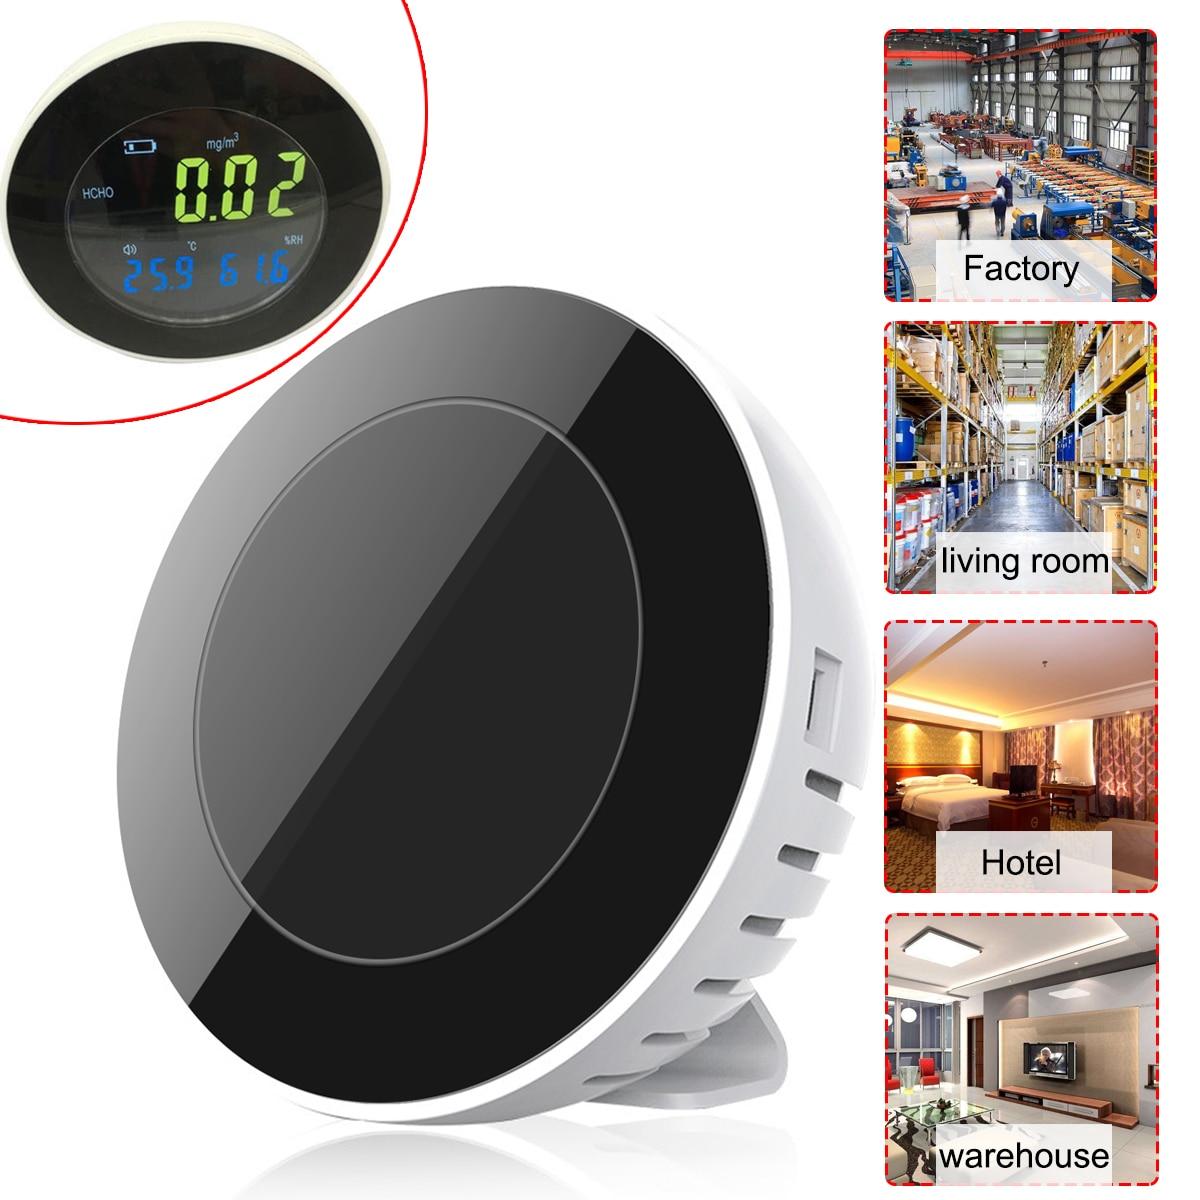 FUNN-Hti NEW HT-502 3 in 1 Co2 Meter Temperature Hygrometer Digital Portable Gas Leak Detector Analyzer formaldehyde Monitor T недорого